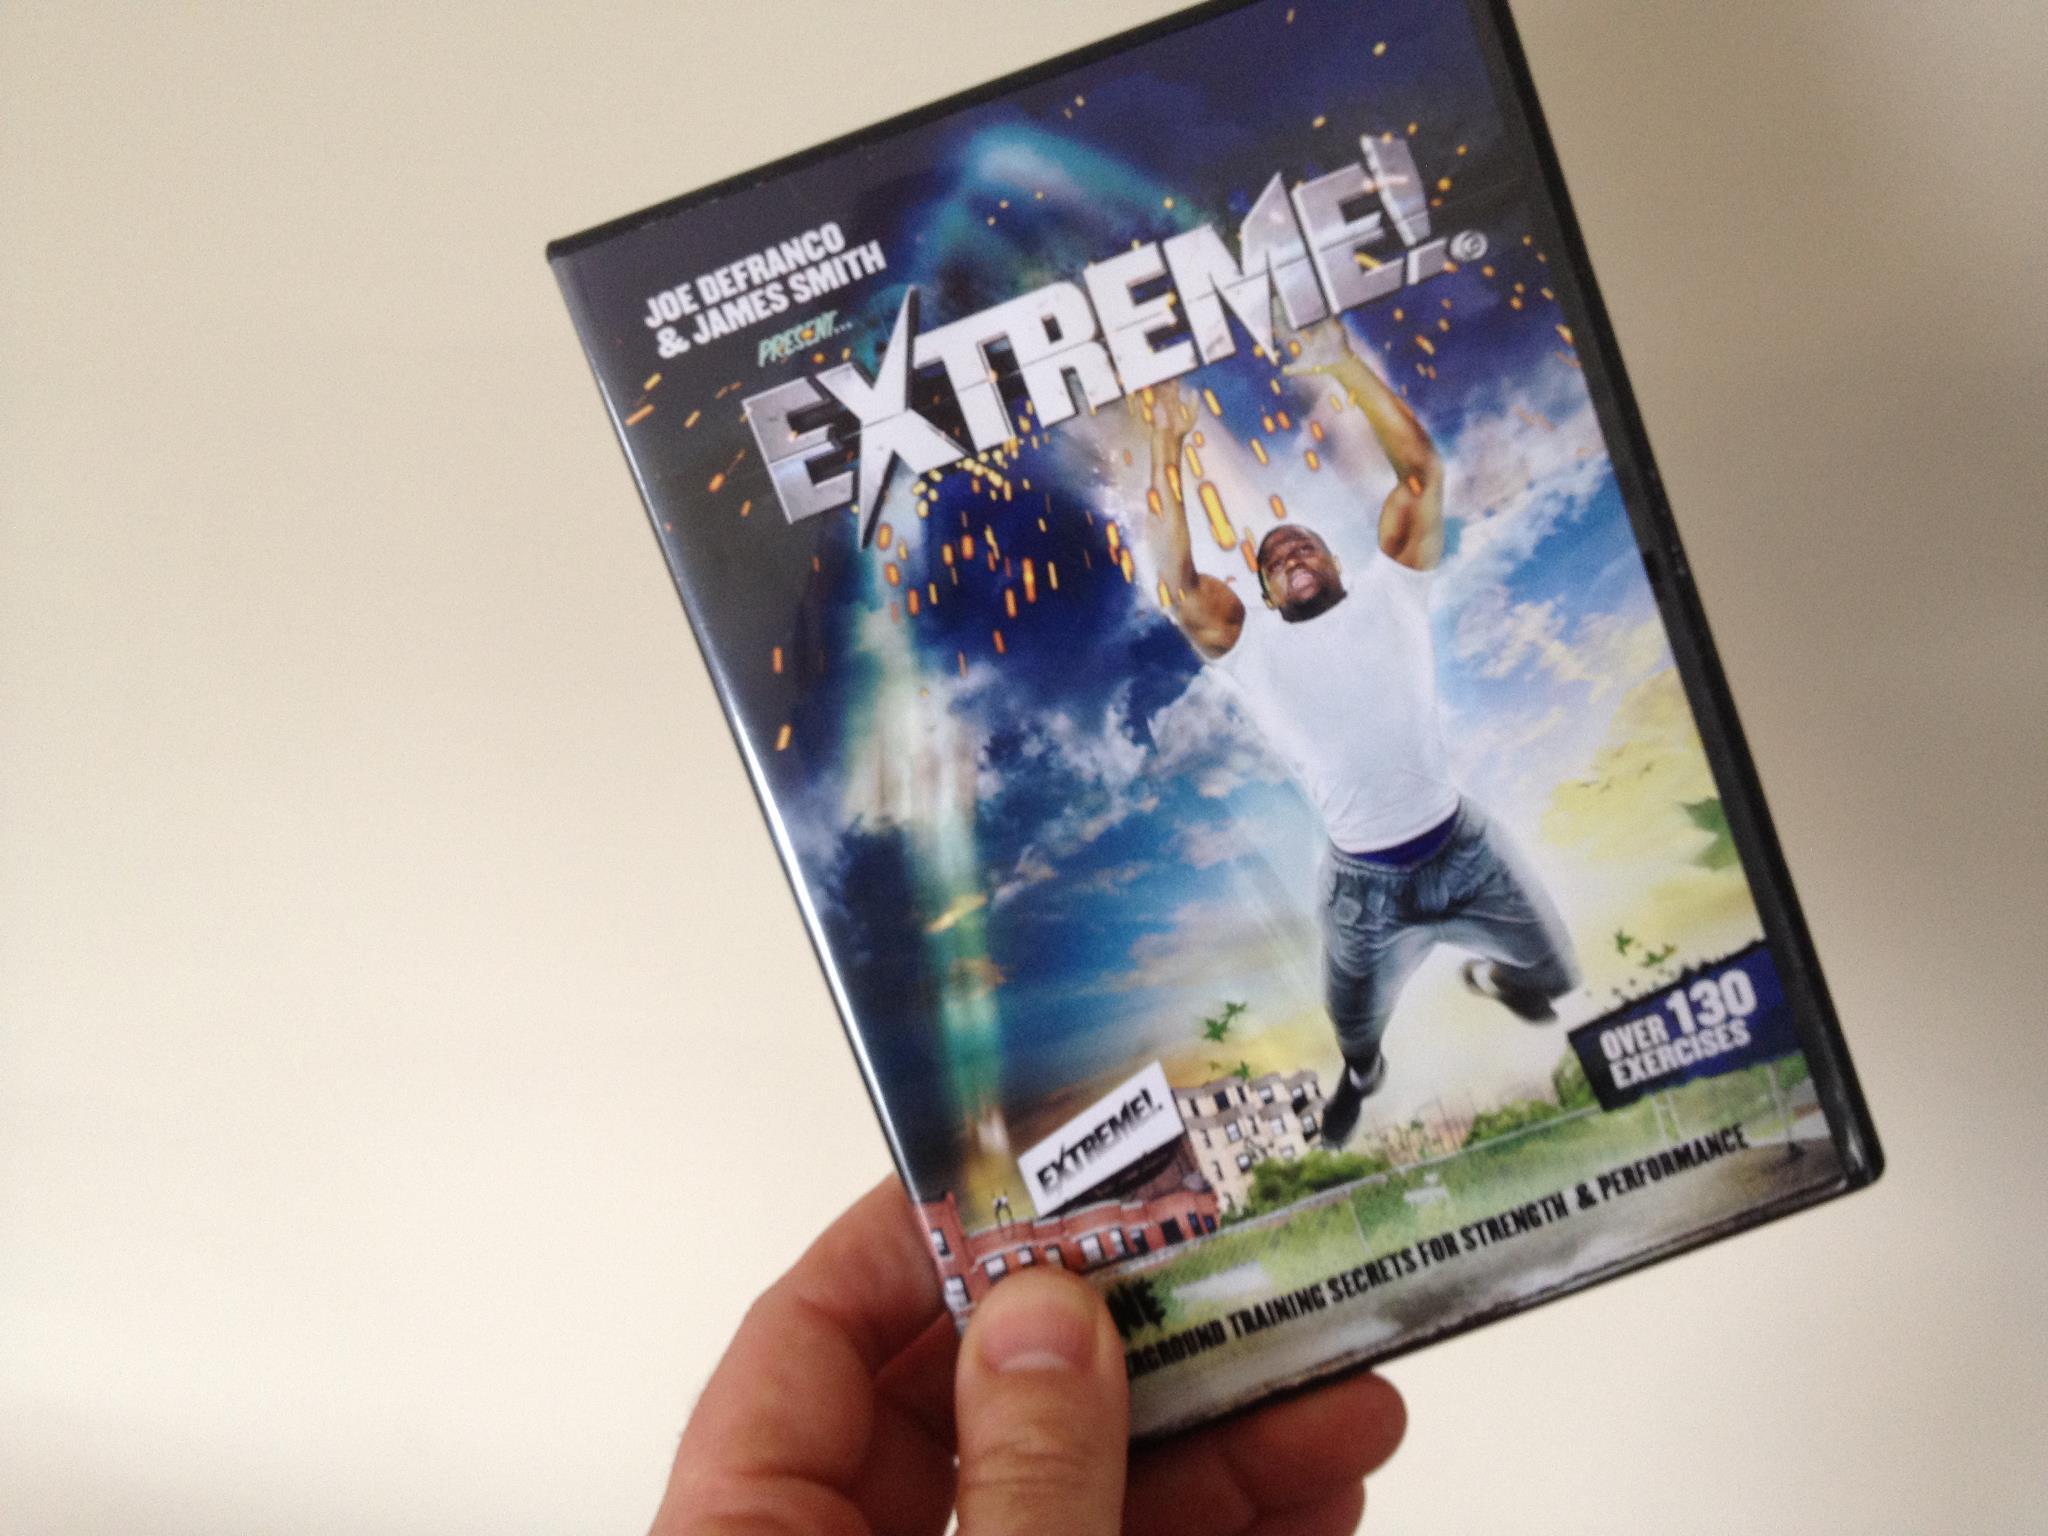 Extreme_dvd_arrives